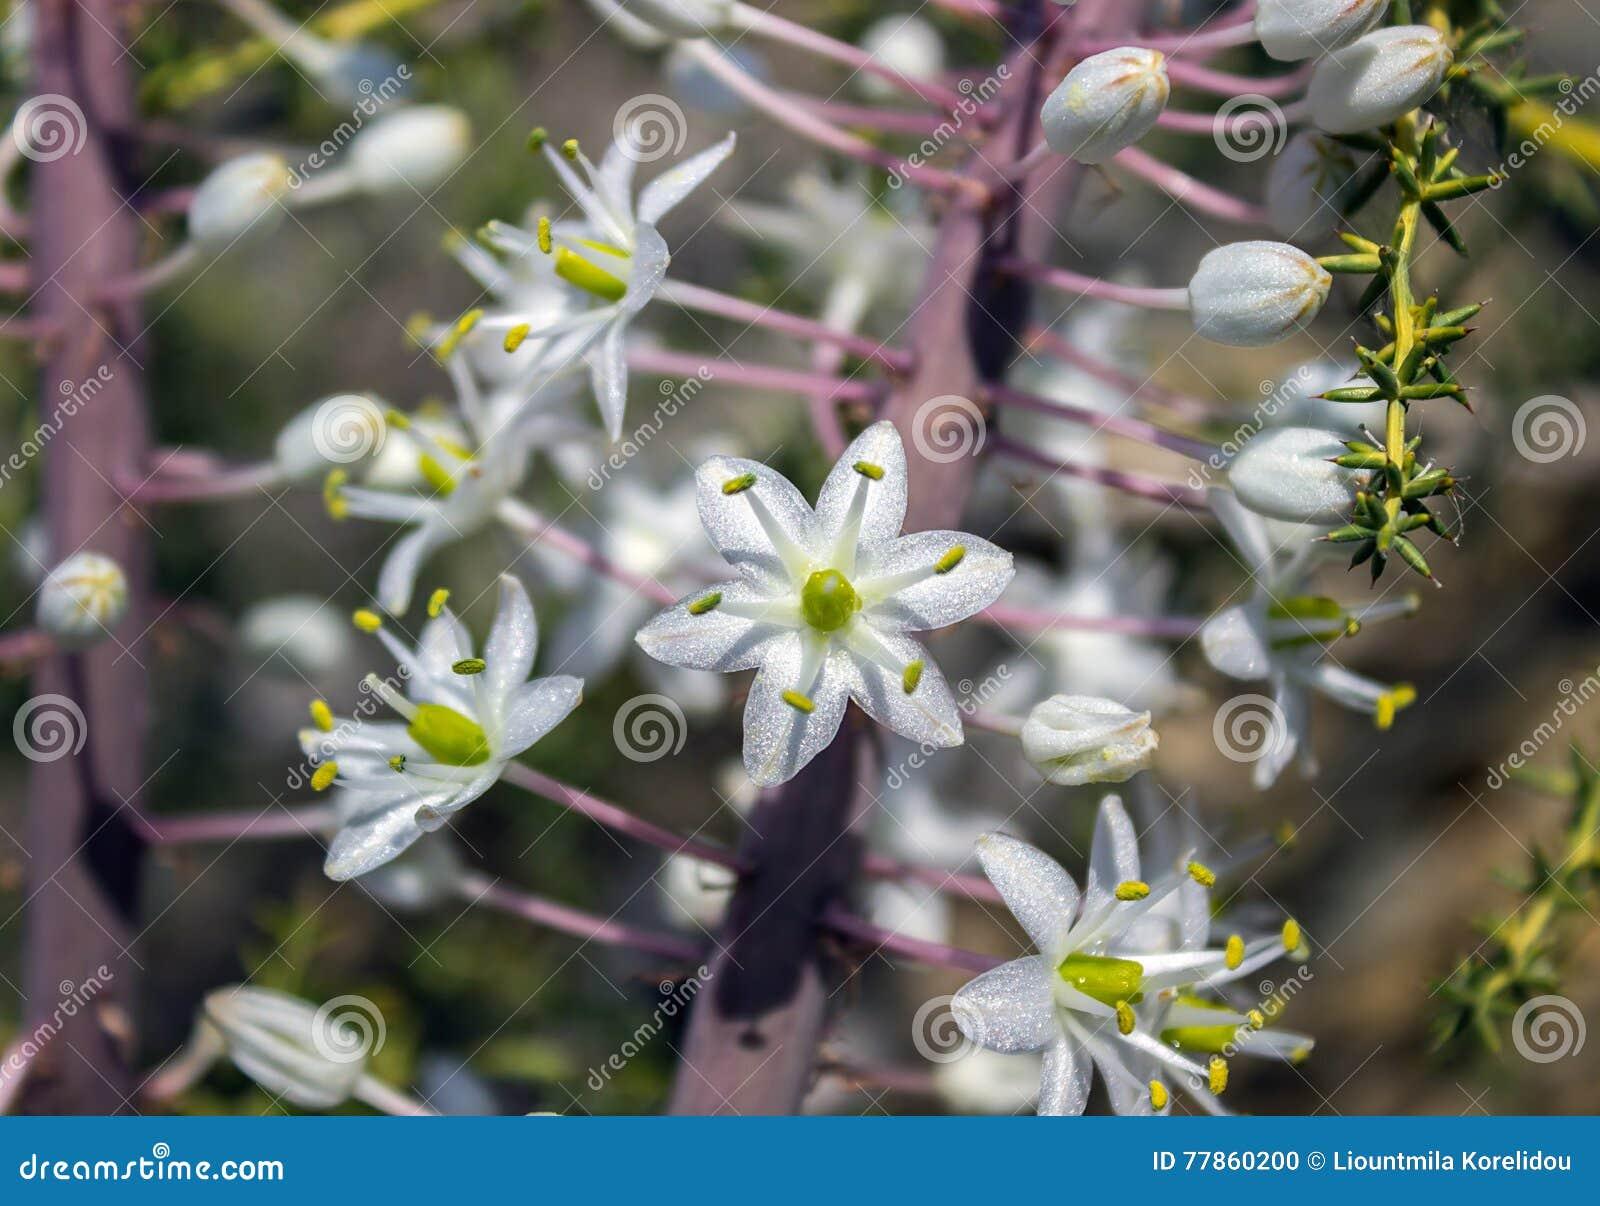 Drmia Martima Unusual Flowers Close Up Stock Photo Image Of